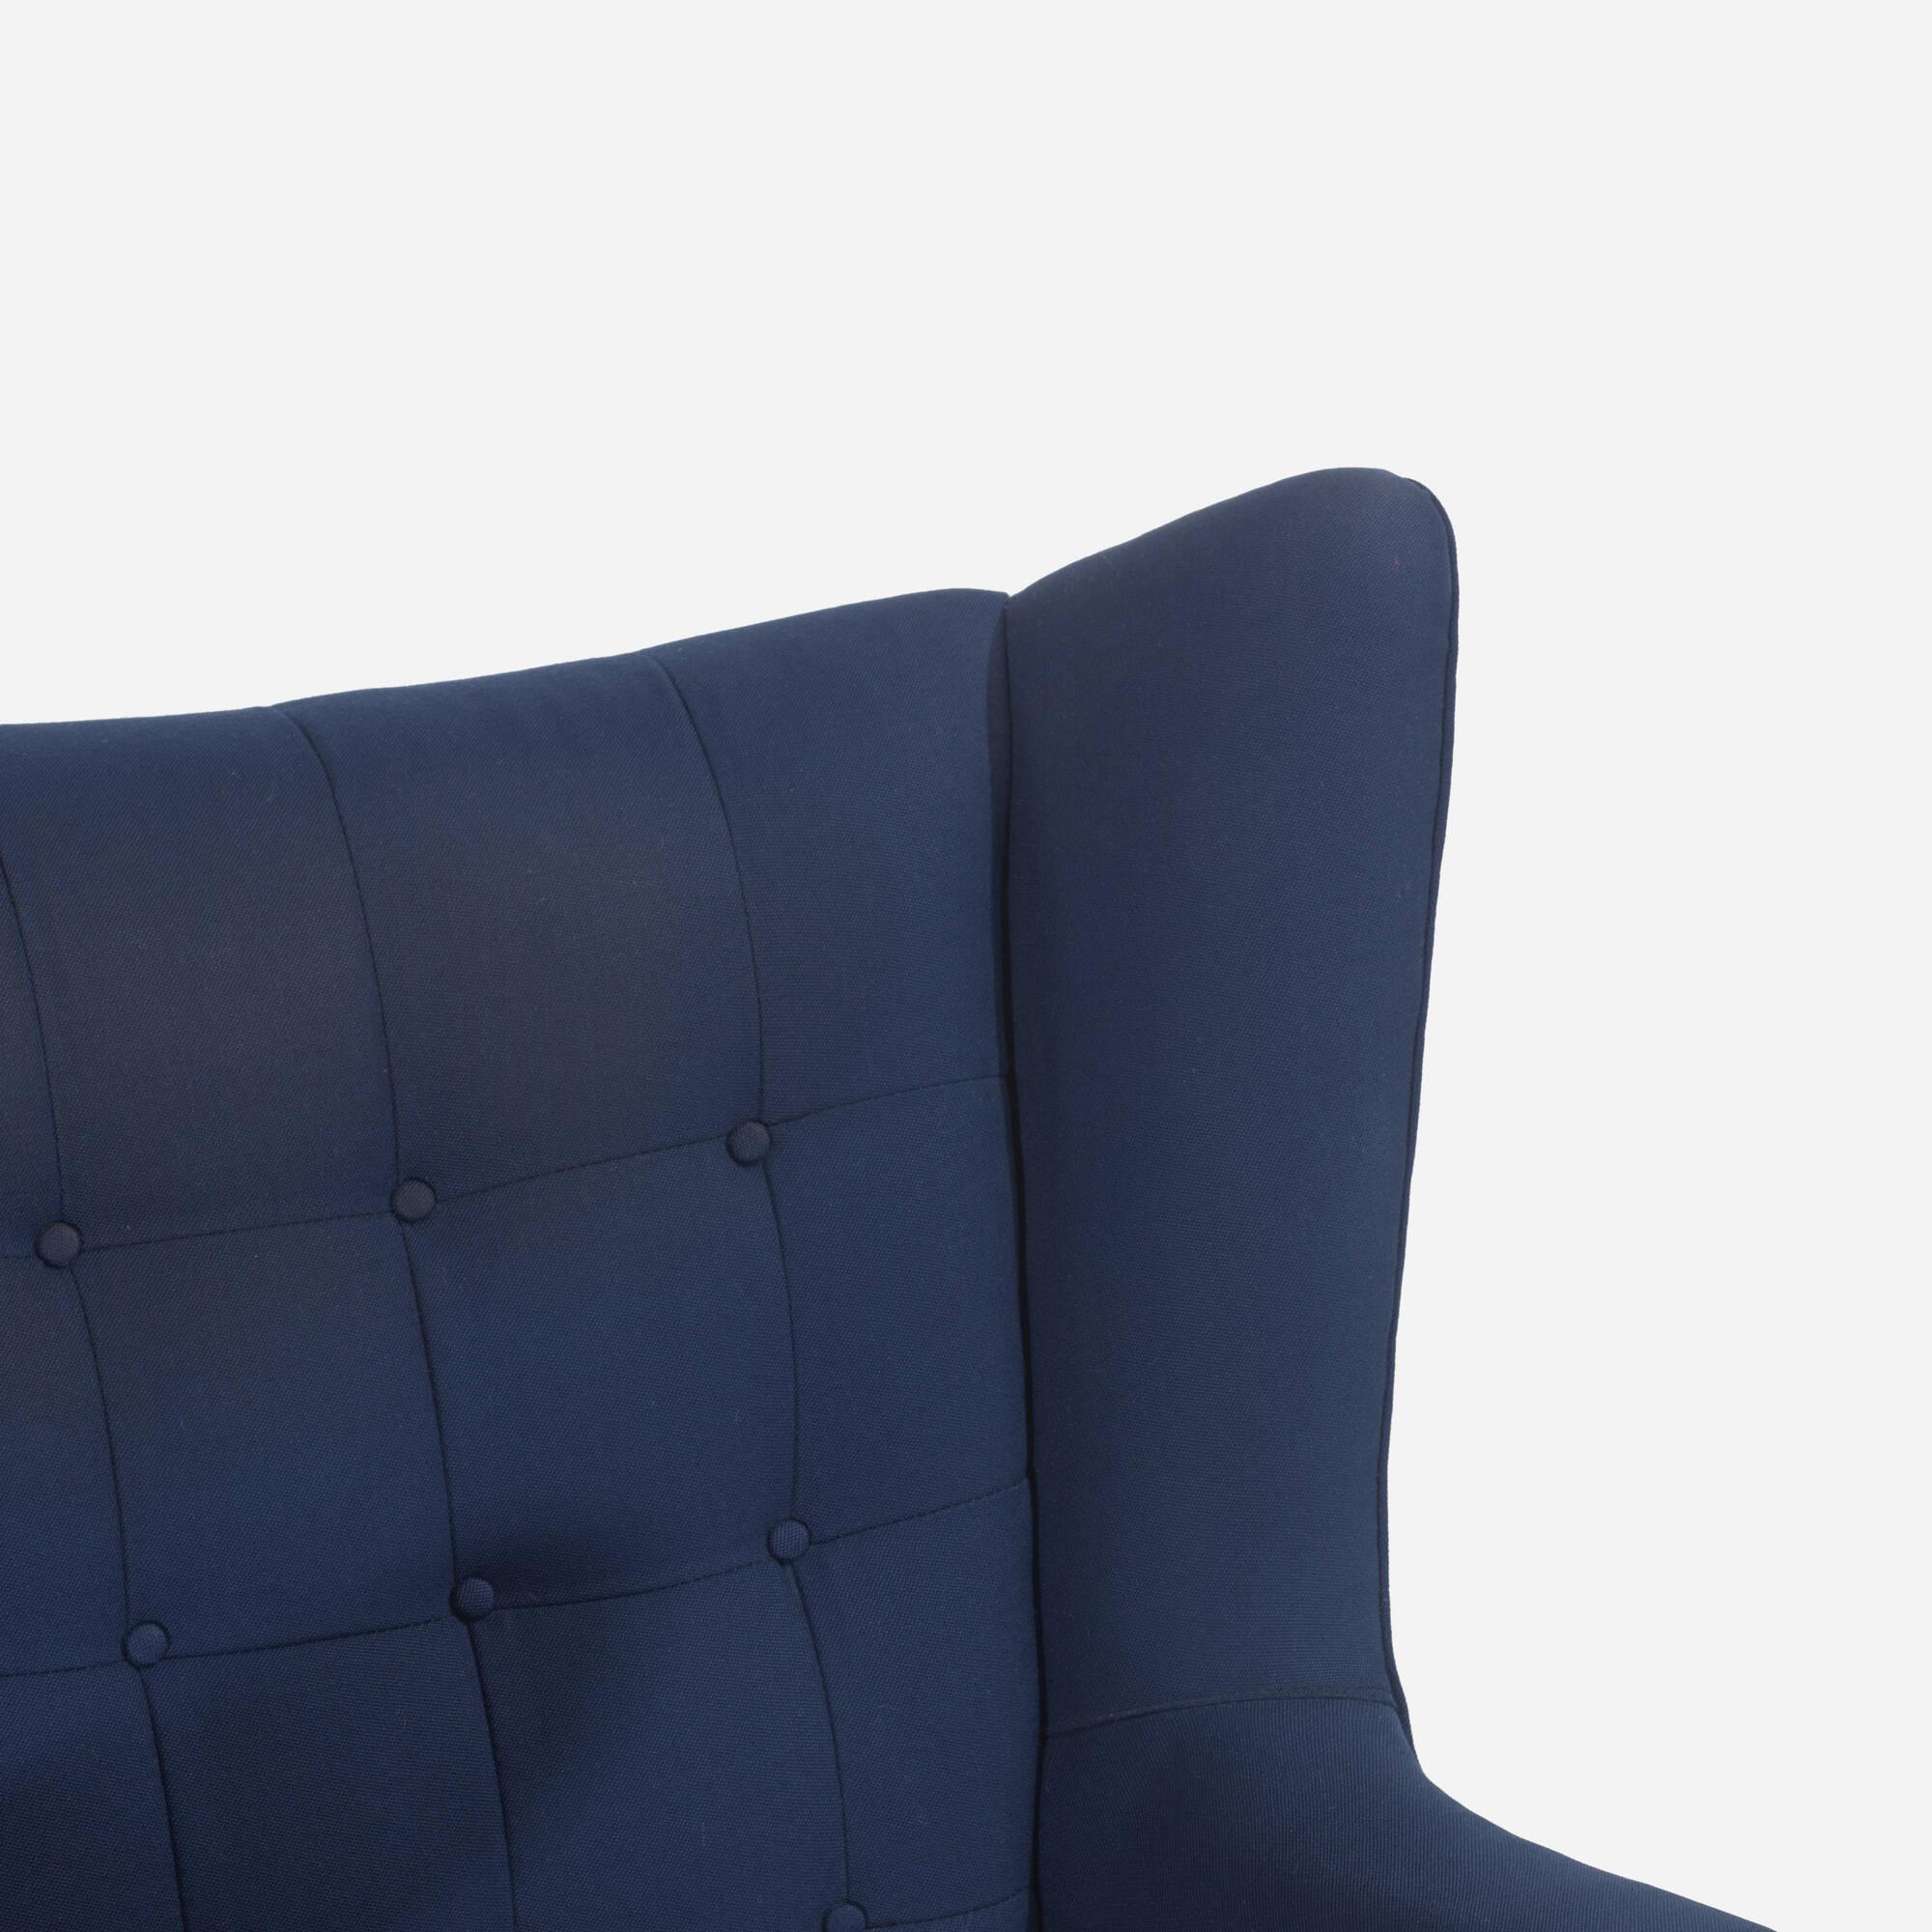 126: Hans J. Wegner / Papa Bear chair and ottoman (3 of 3)